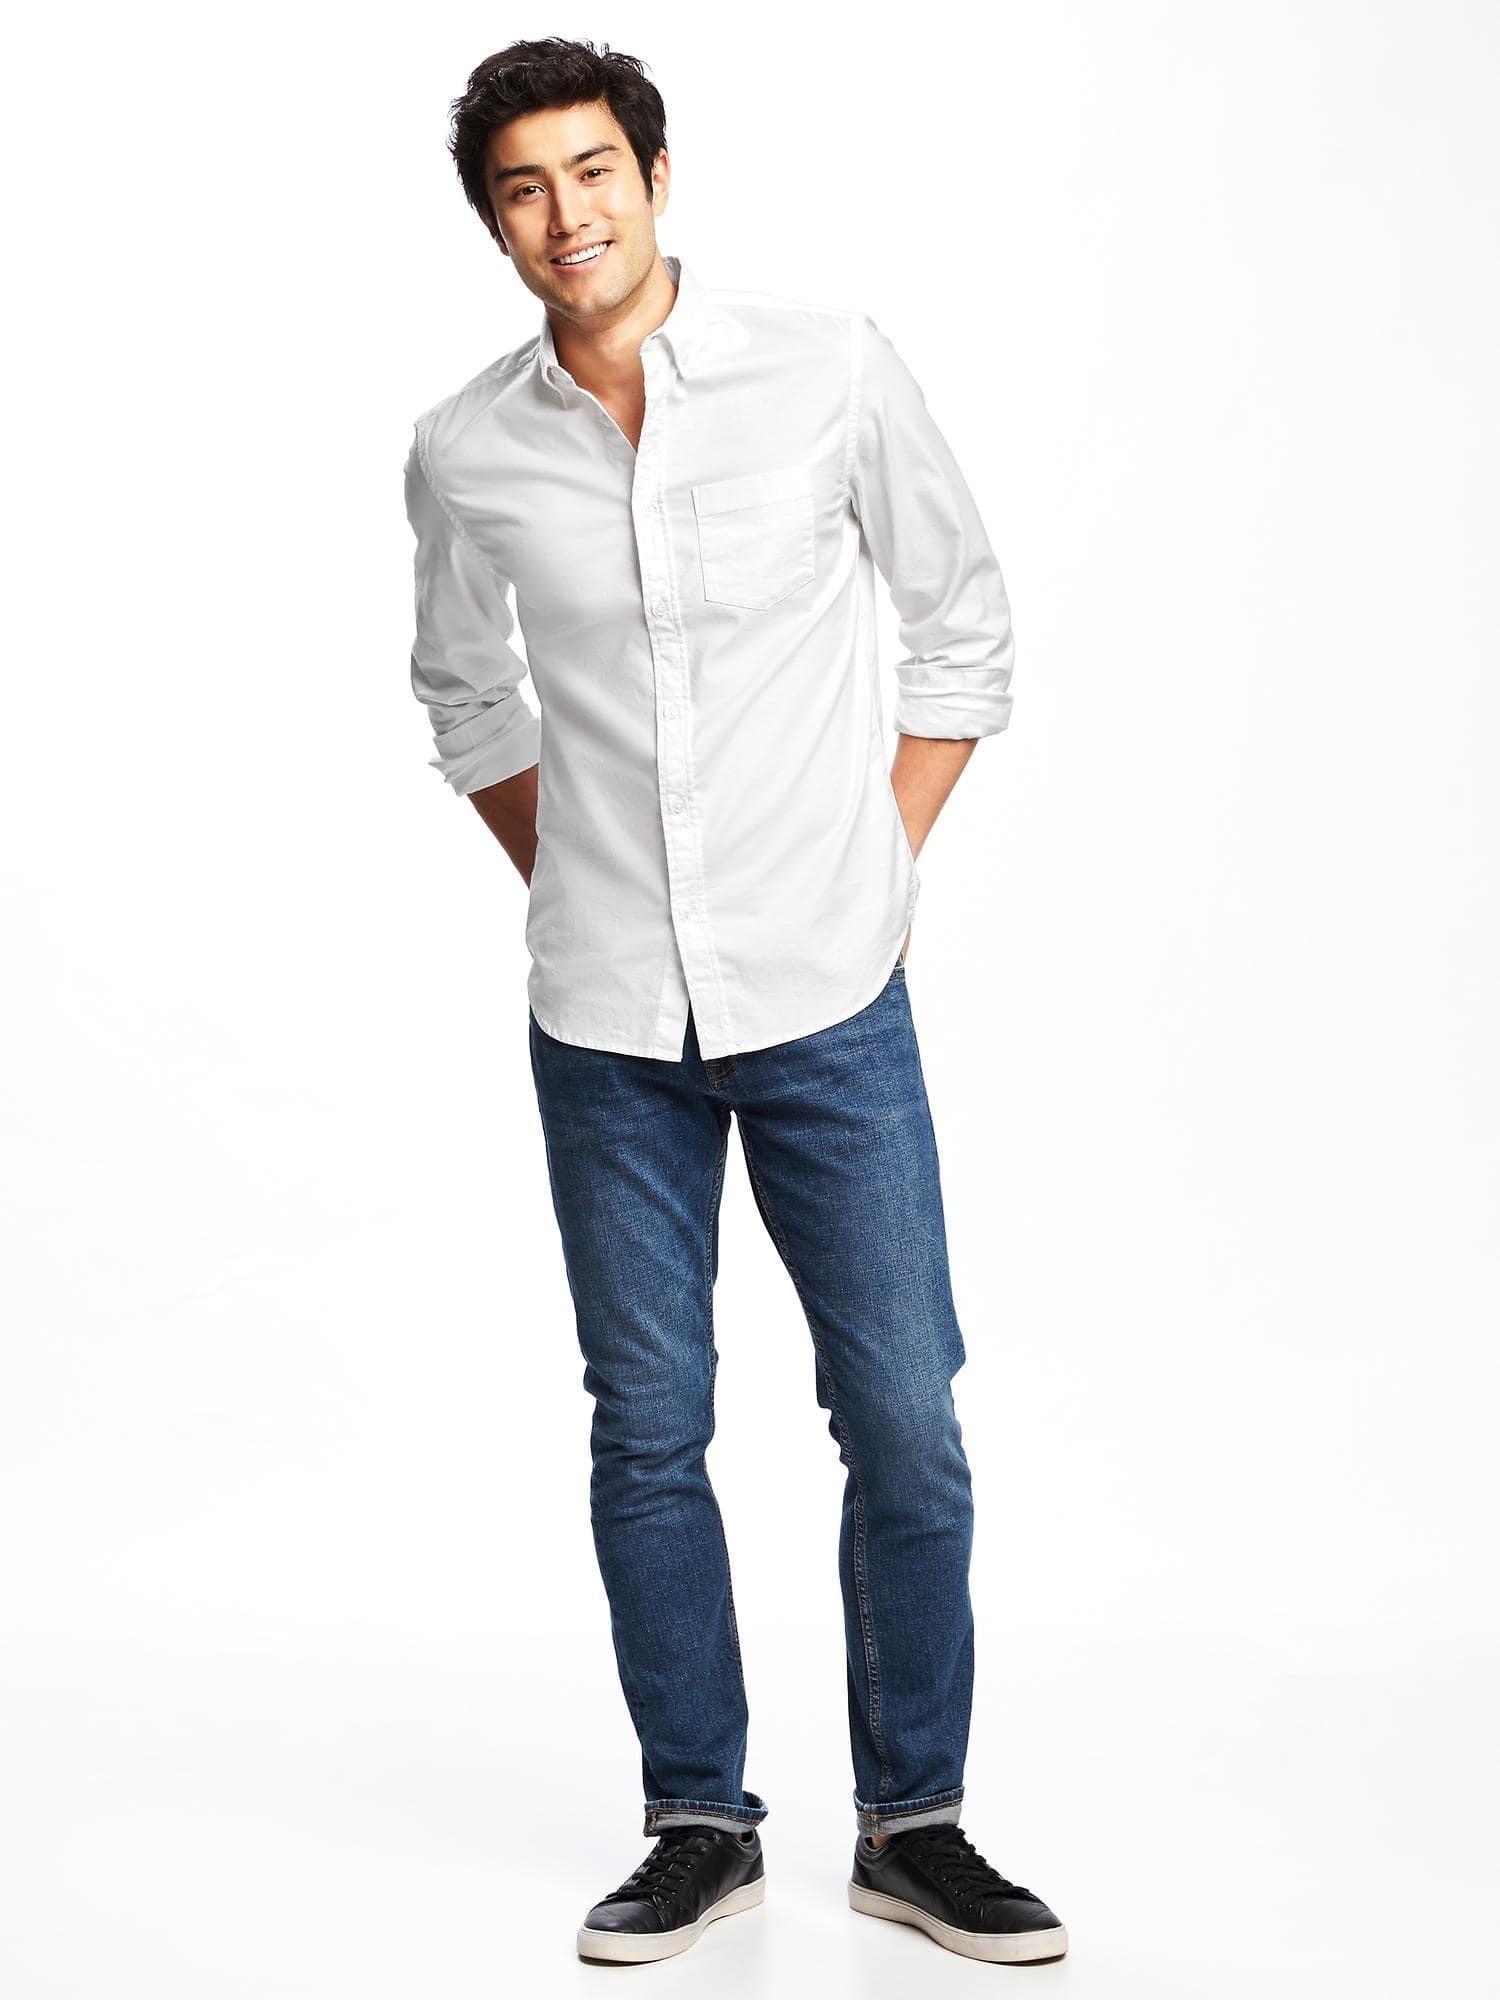 White Long Sleeve Shirt, Blue Jeans